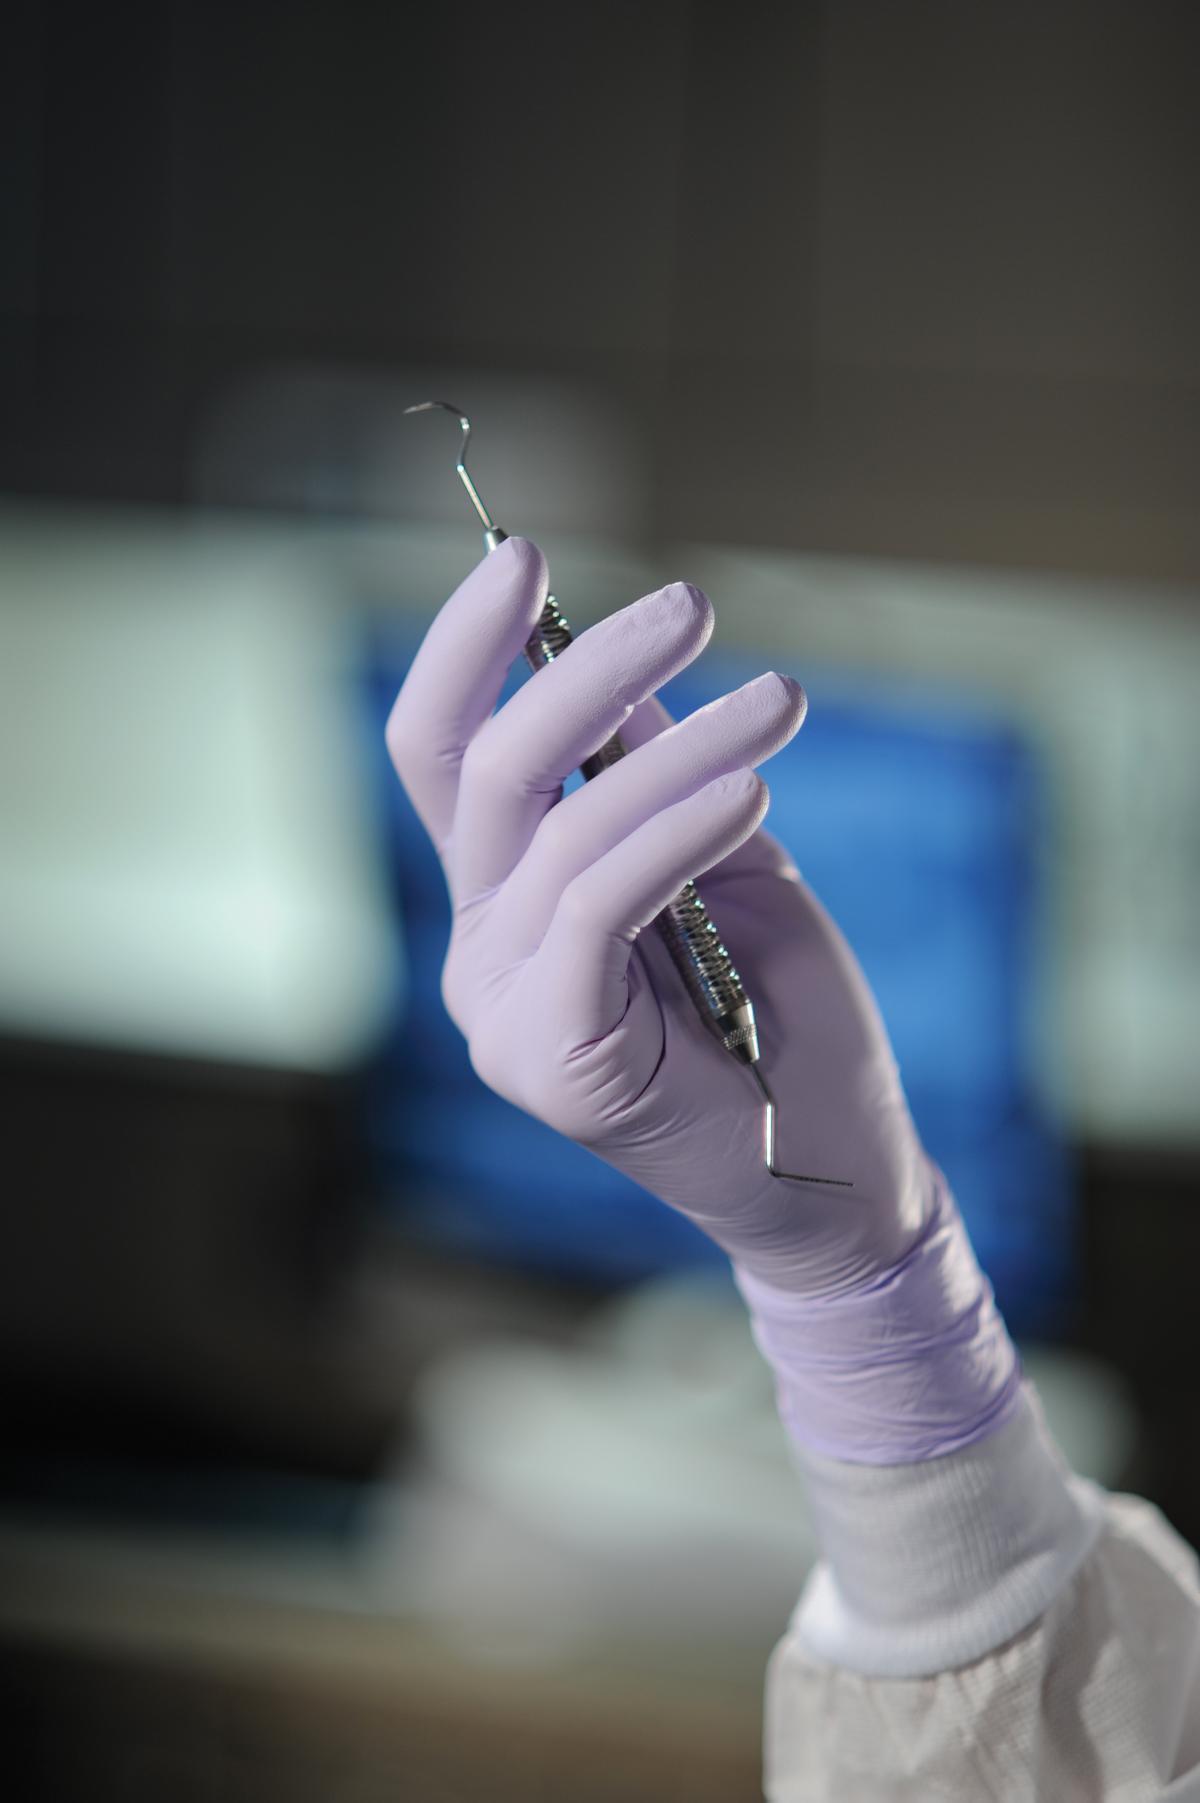 Textured latex exam gloves